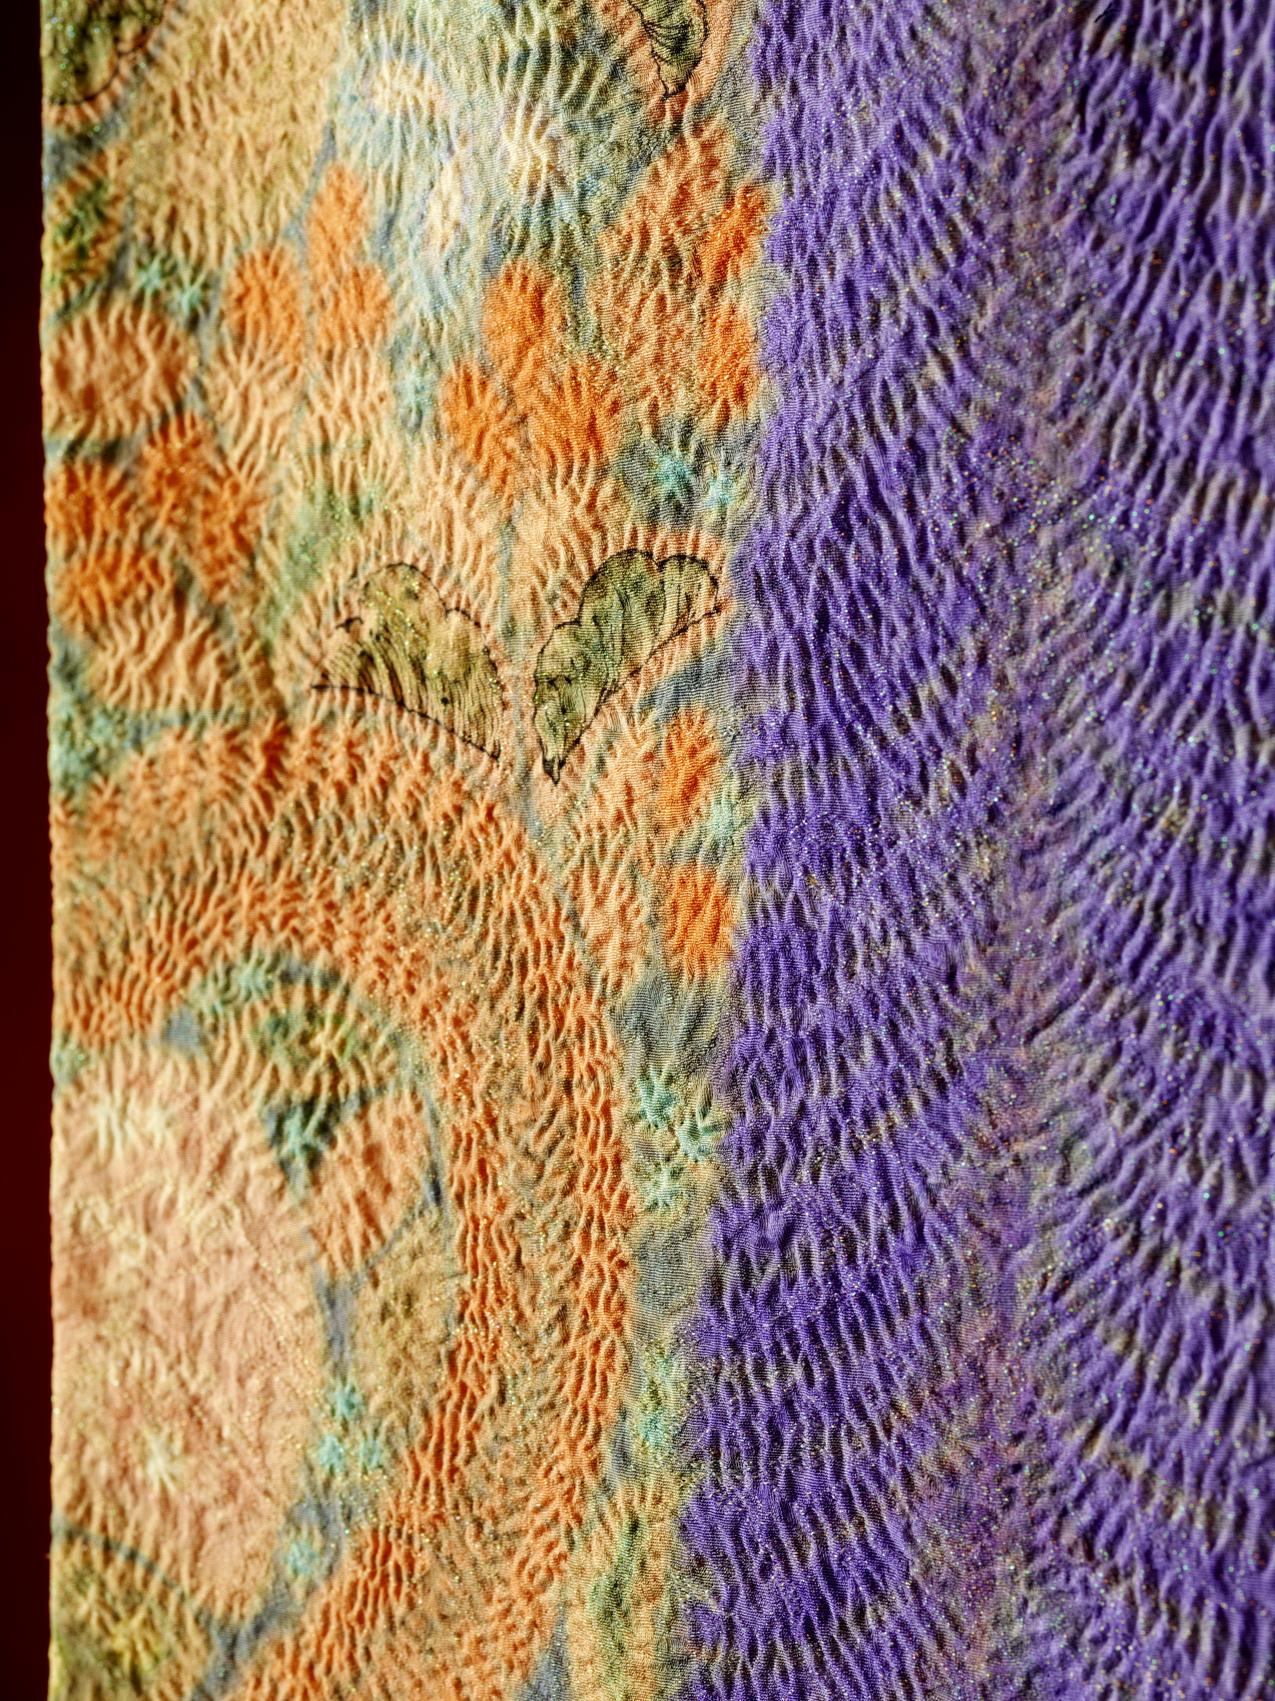 Kubota's creative process – Itchiku tsujigahana